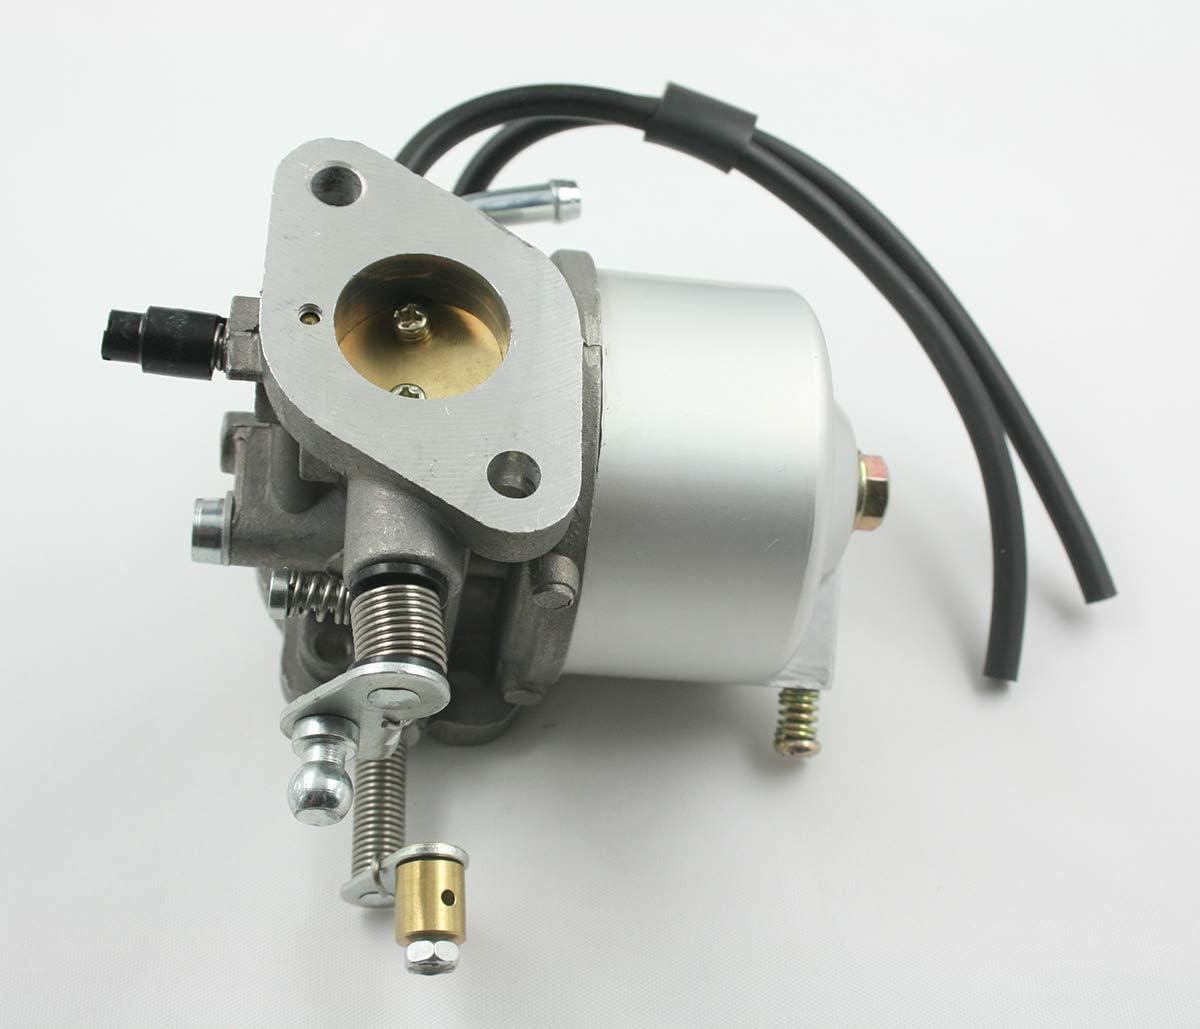 XtremeAmazing Carburetor for EZ-GO Golf Cart 295CC 4 Cycle 1991-UP on